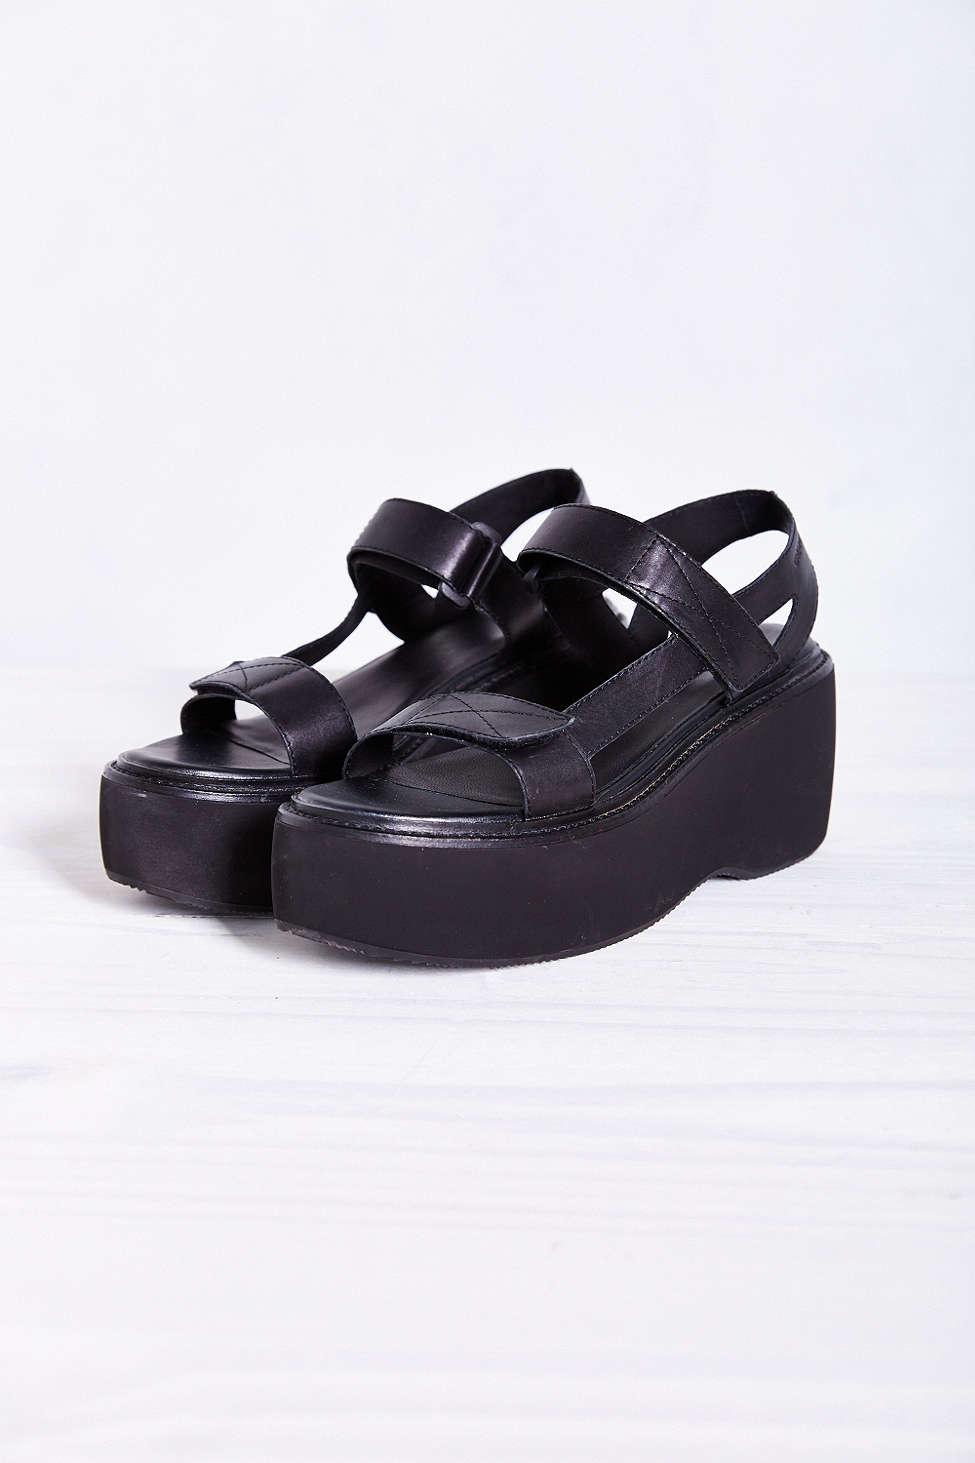 5d42f68b53f2 Lyst - Vagabond Alexis Sandal in Black